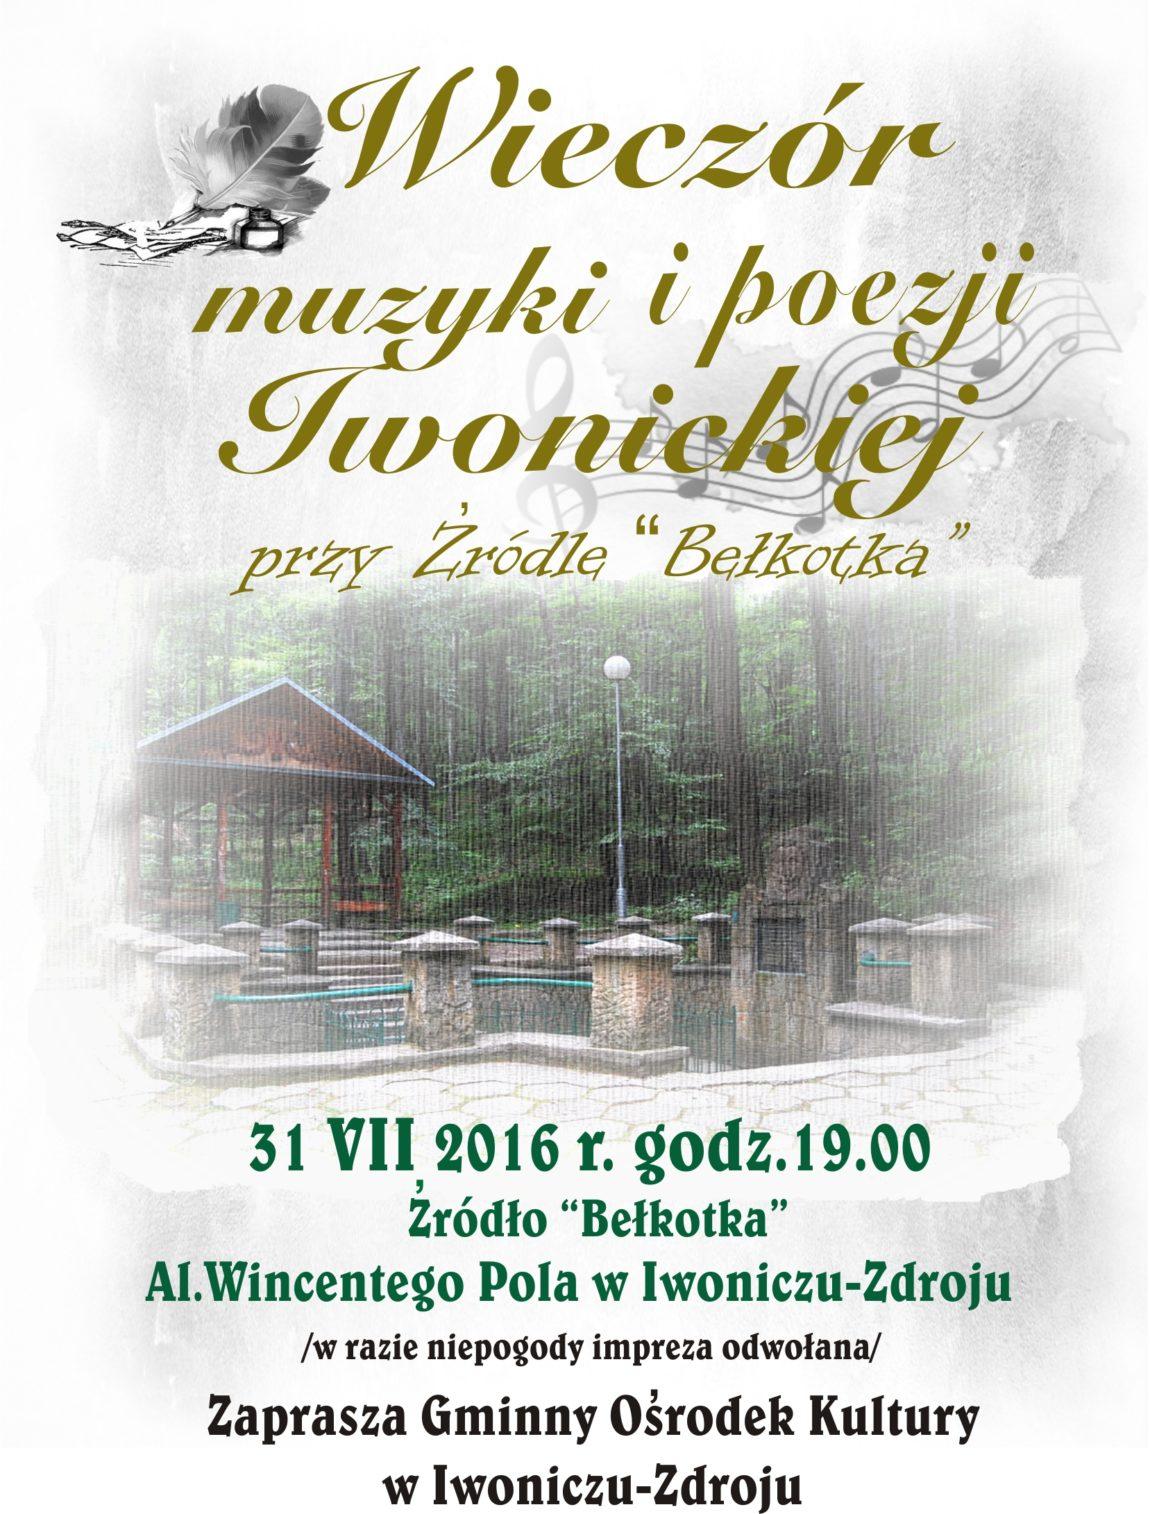 Bełkotka